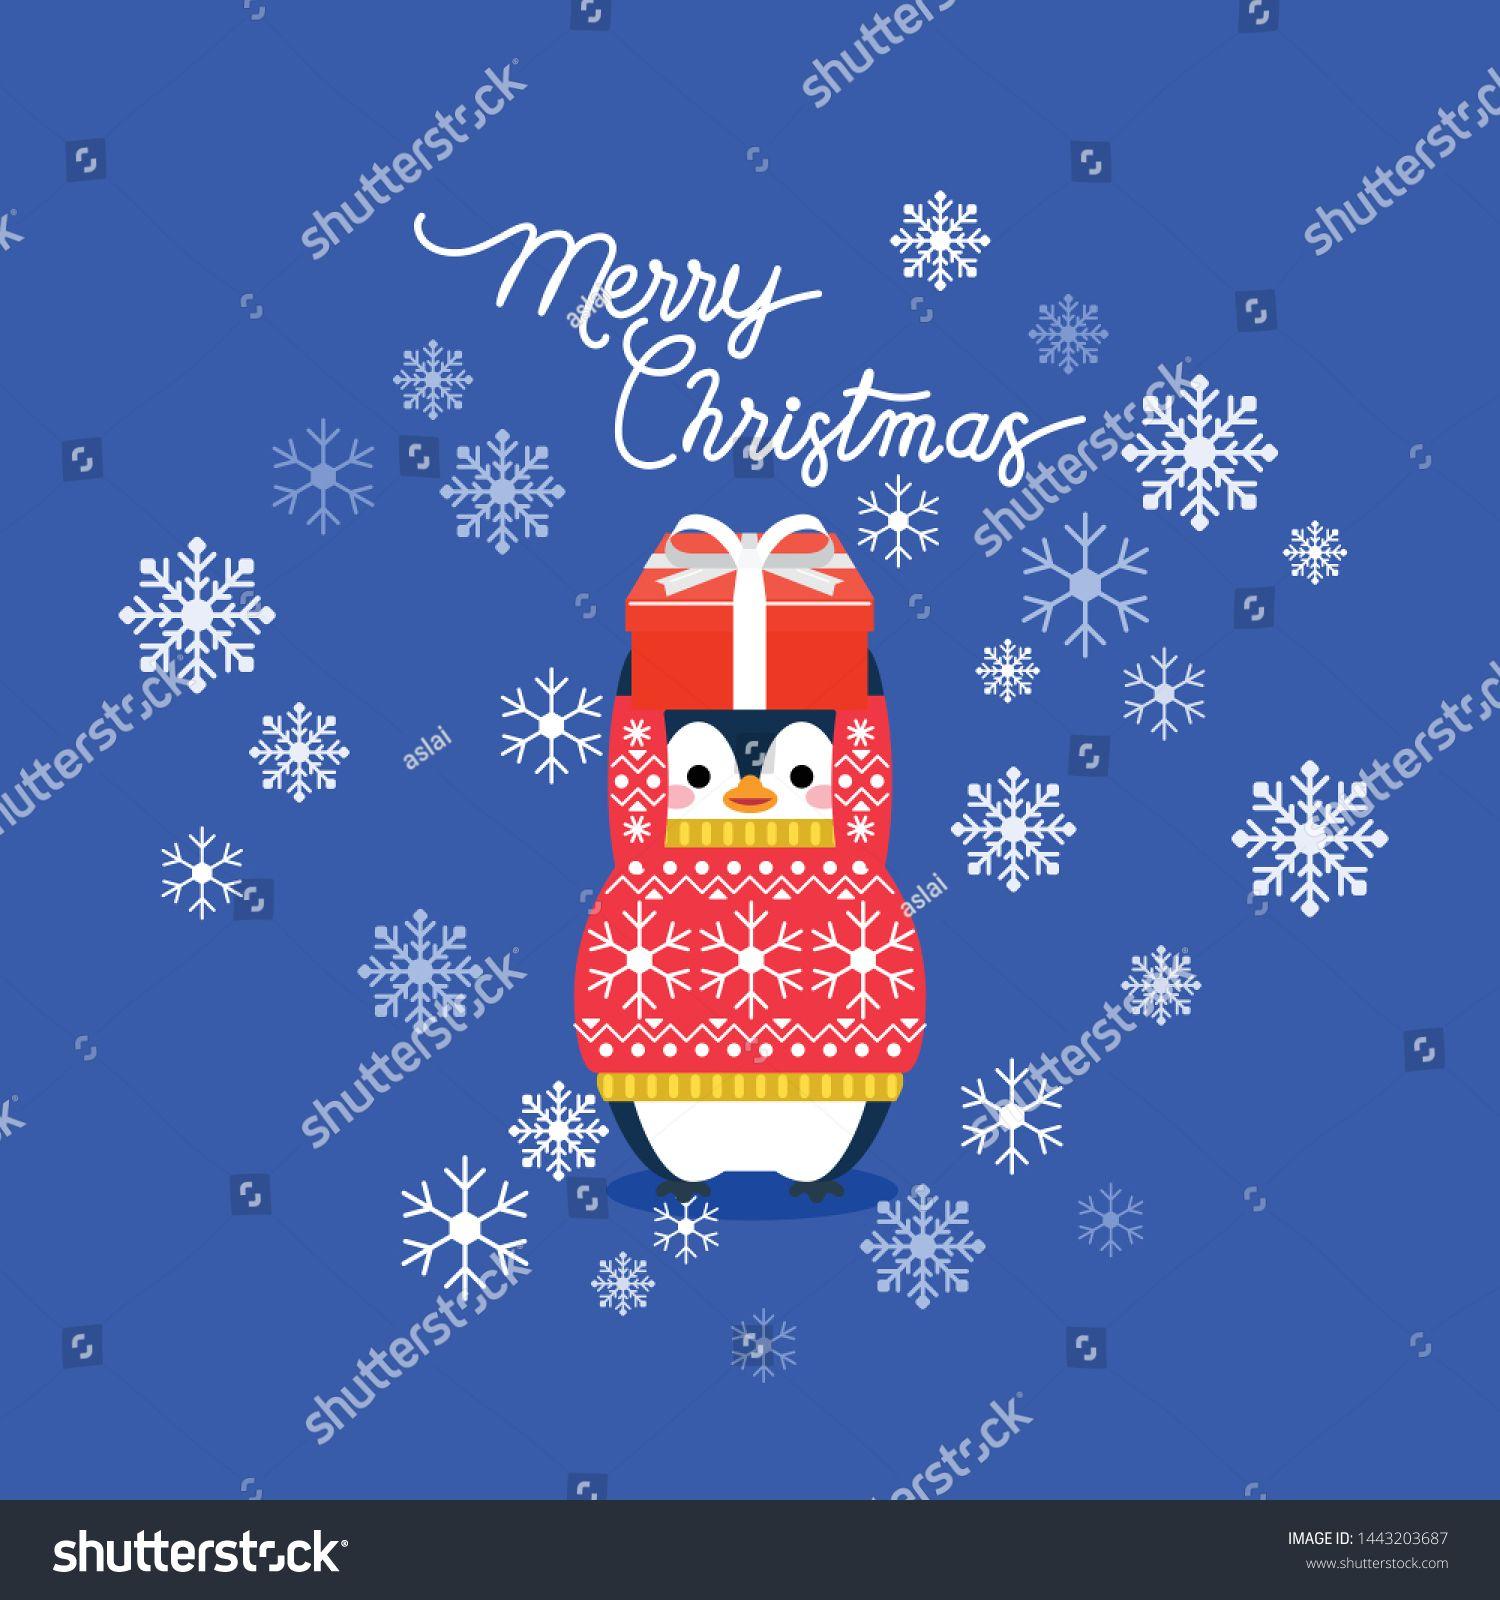 Vector holiday Christmas greeting card with cartoon